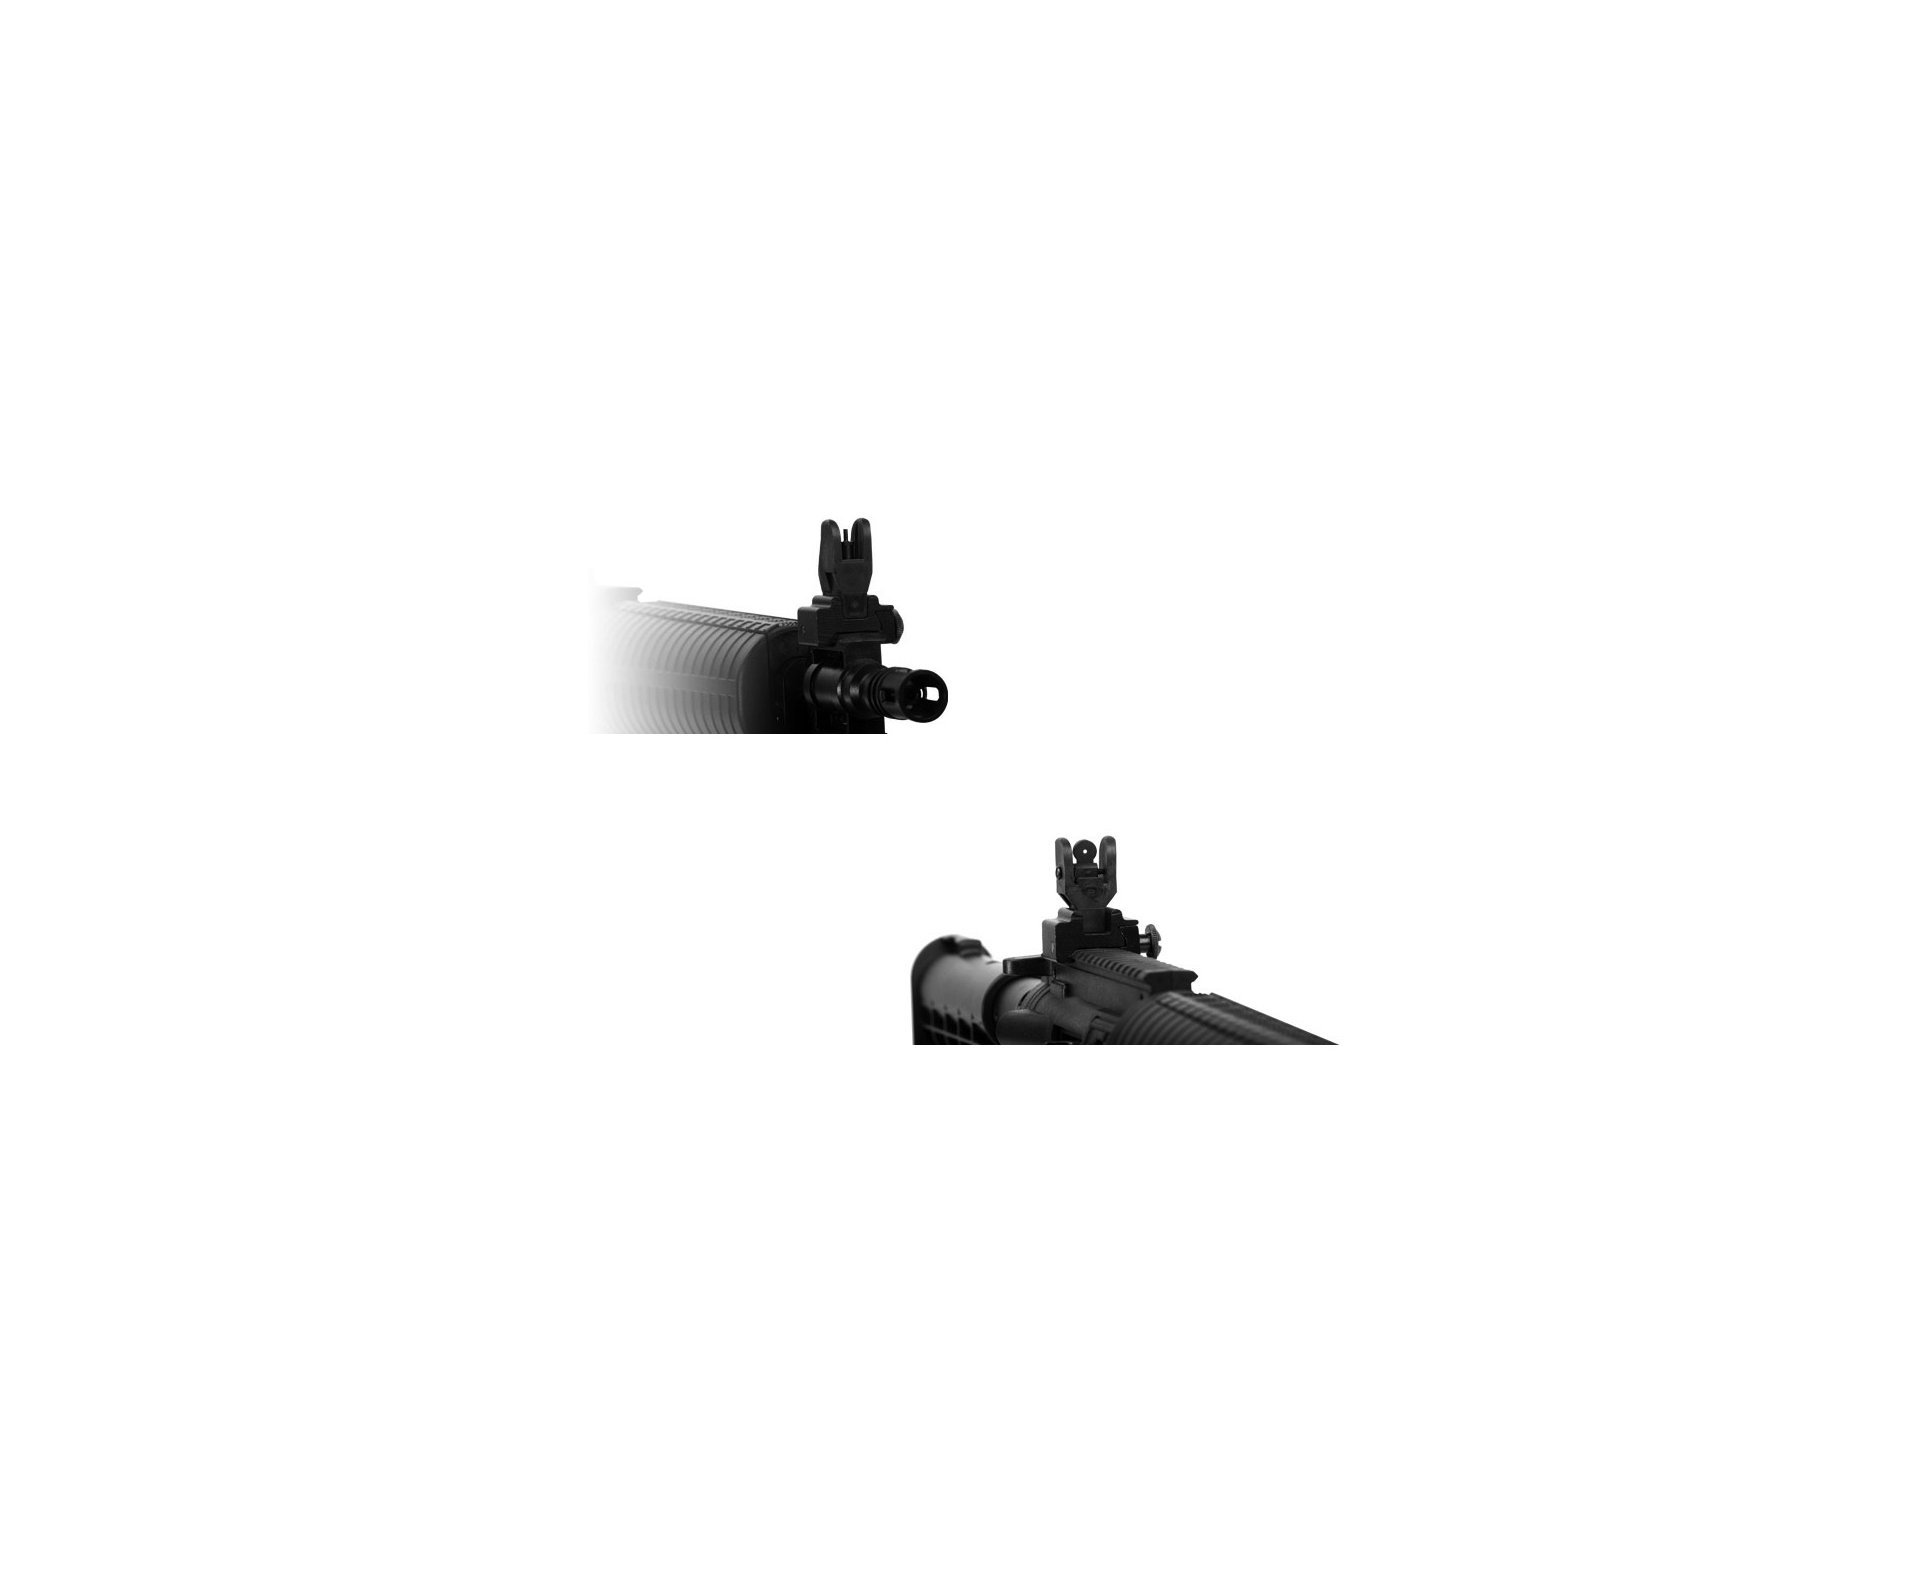 Carabina De Ar Crosman M4-177 Multi Pump - Cal 4,5 Mm + Capa Especial + Lanterna Tactical + Chumbinhos